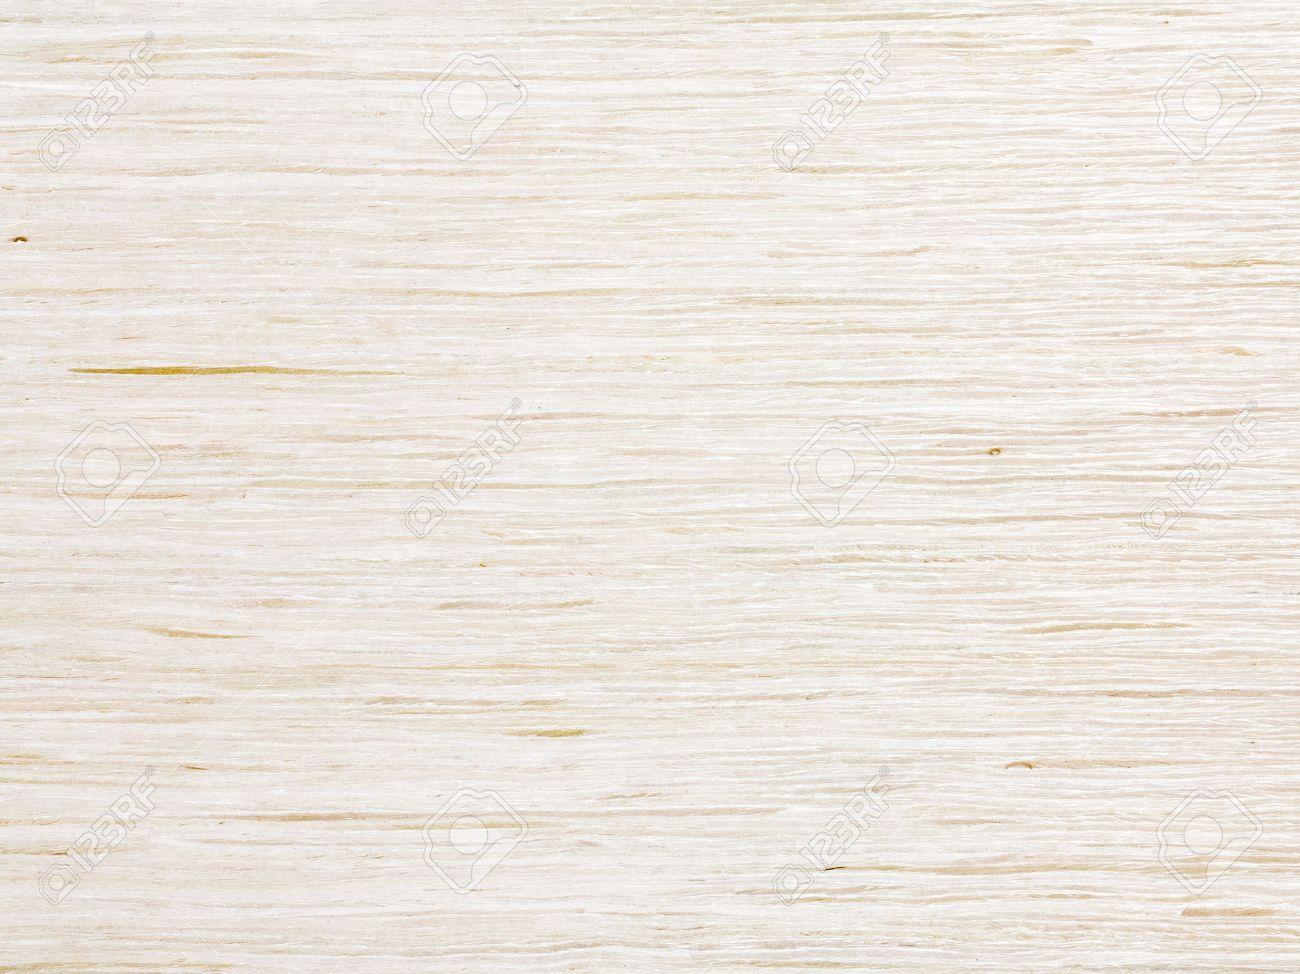 white oak wood - Ataum berglauf-verband com